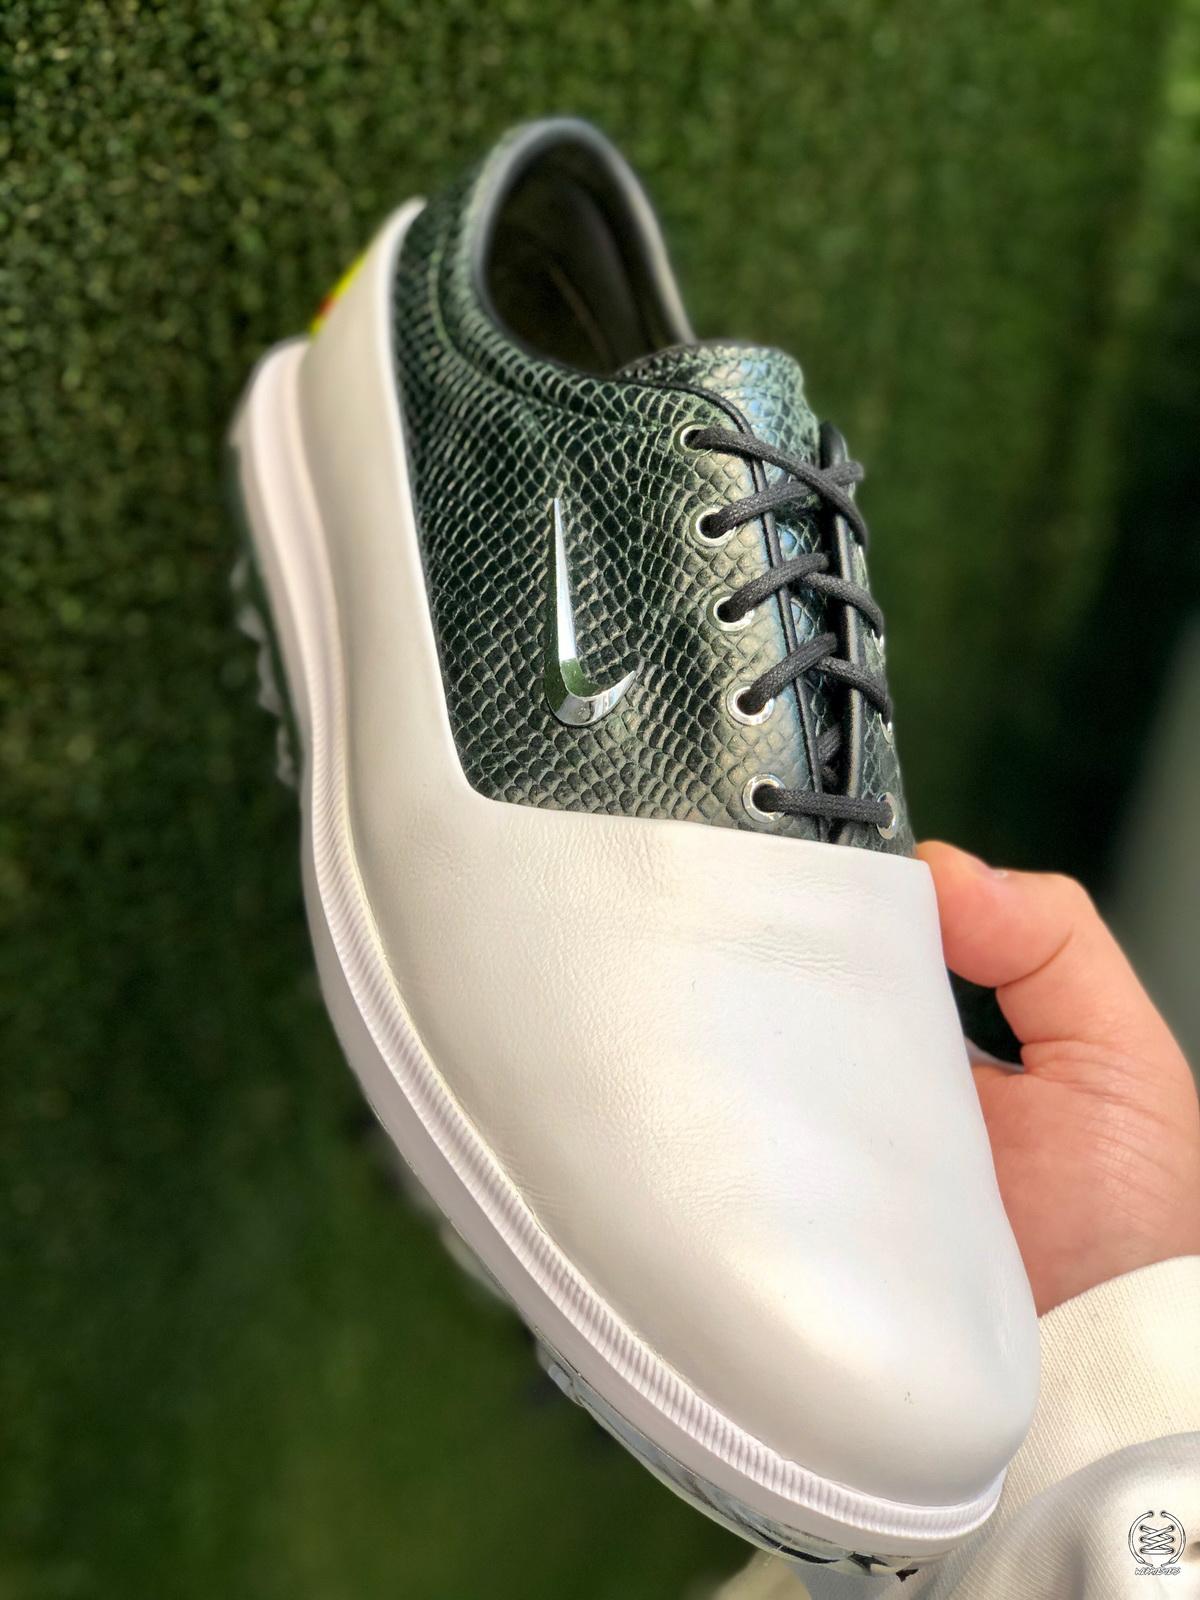 Nike Golf - Masters - Air Zoom Victory